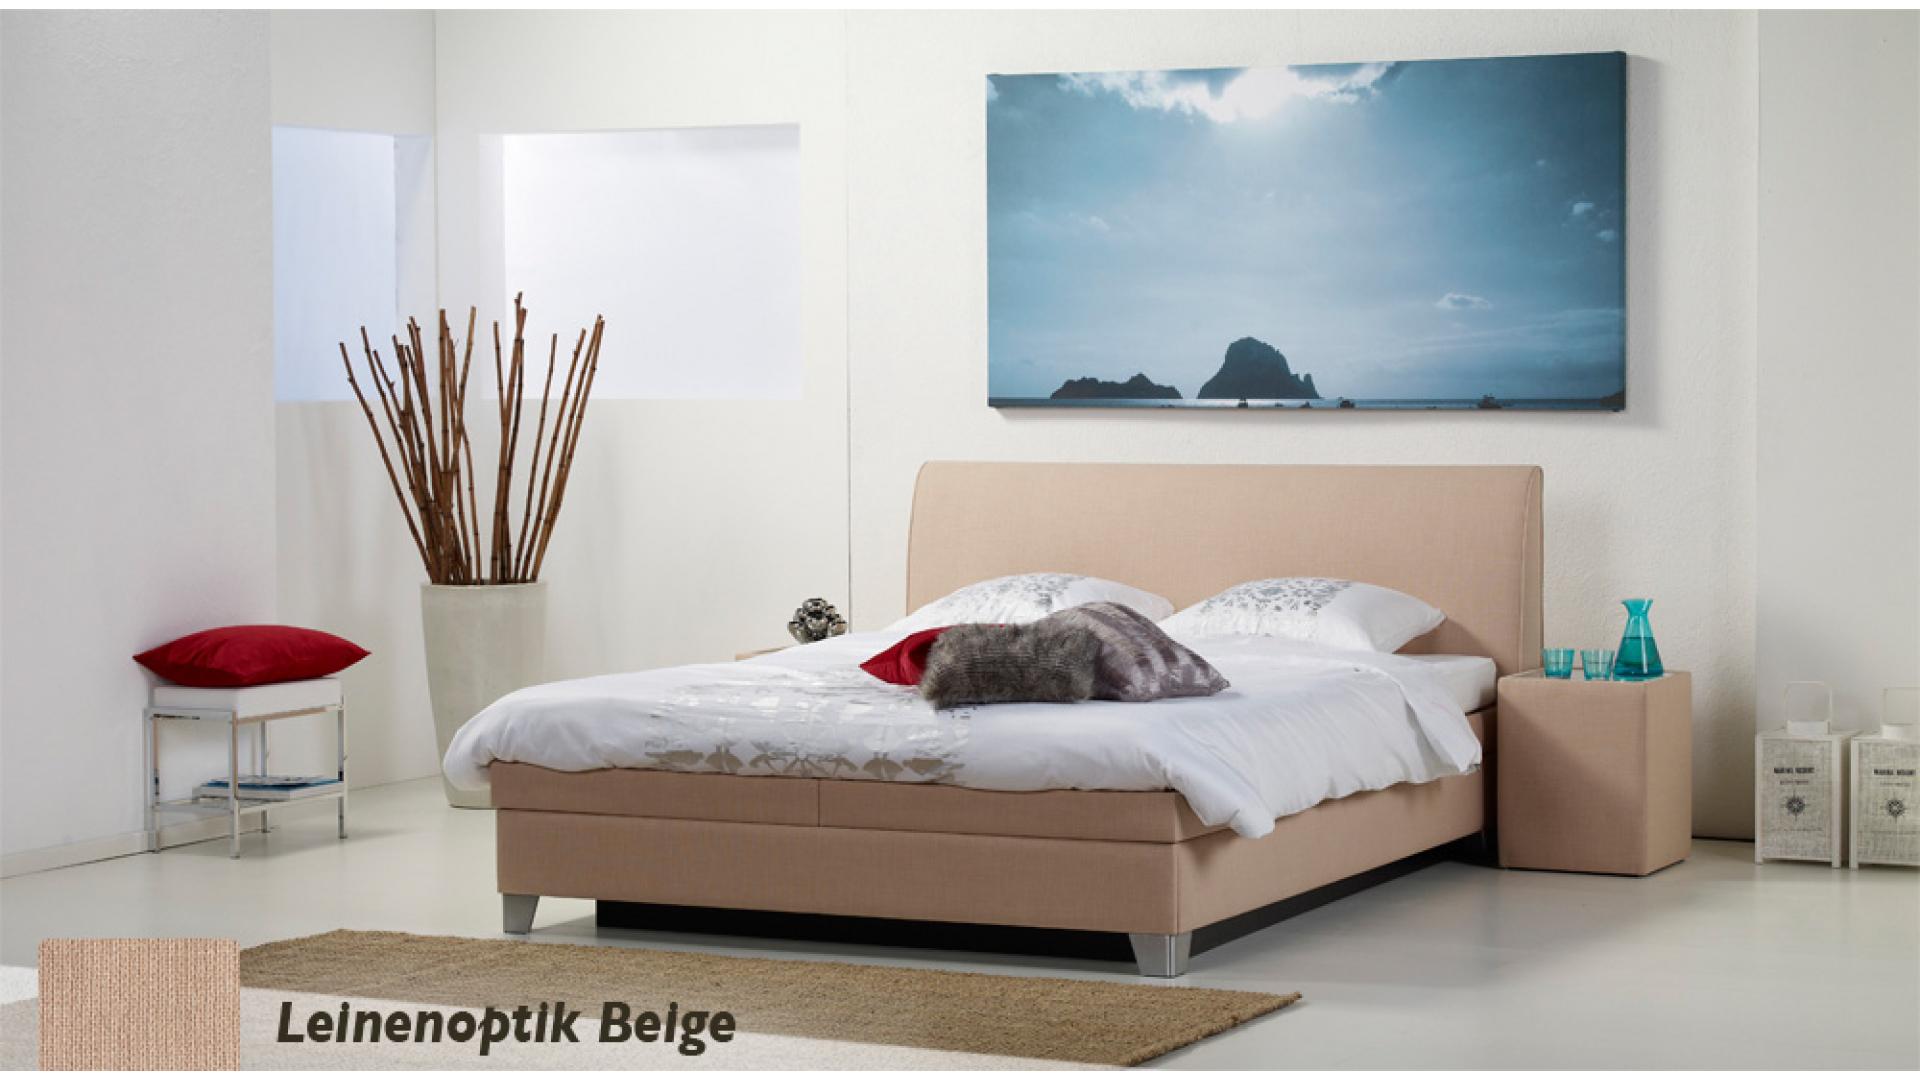 wasserbett luxus box pro leinenoptik beige boxspring-look